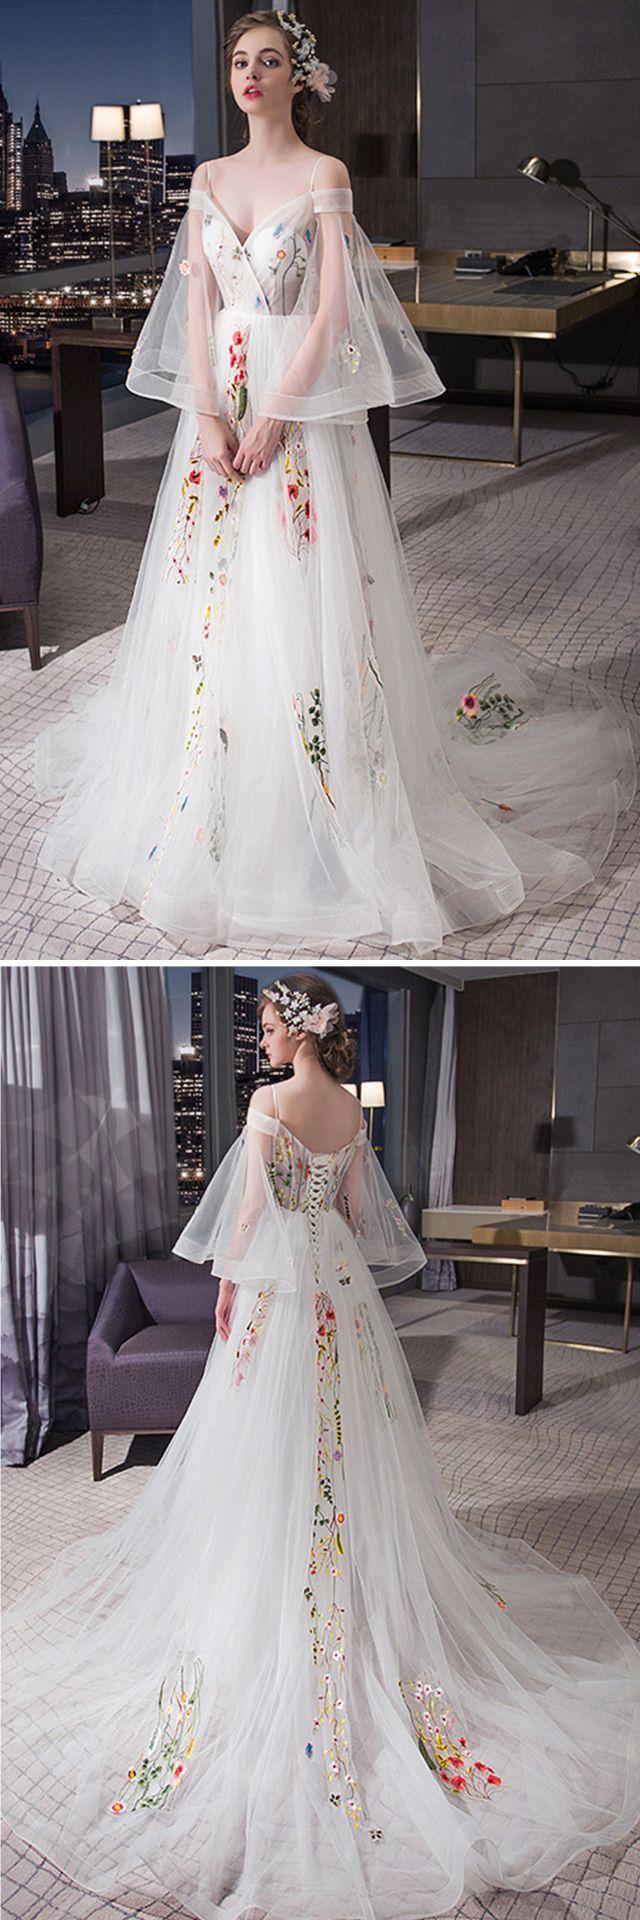 Ksl wedding dress  Pin by C L on Inspirational Clothing  Pinterest  Gowns Wedding